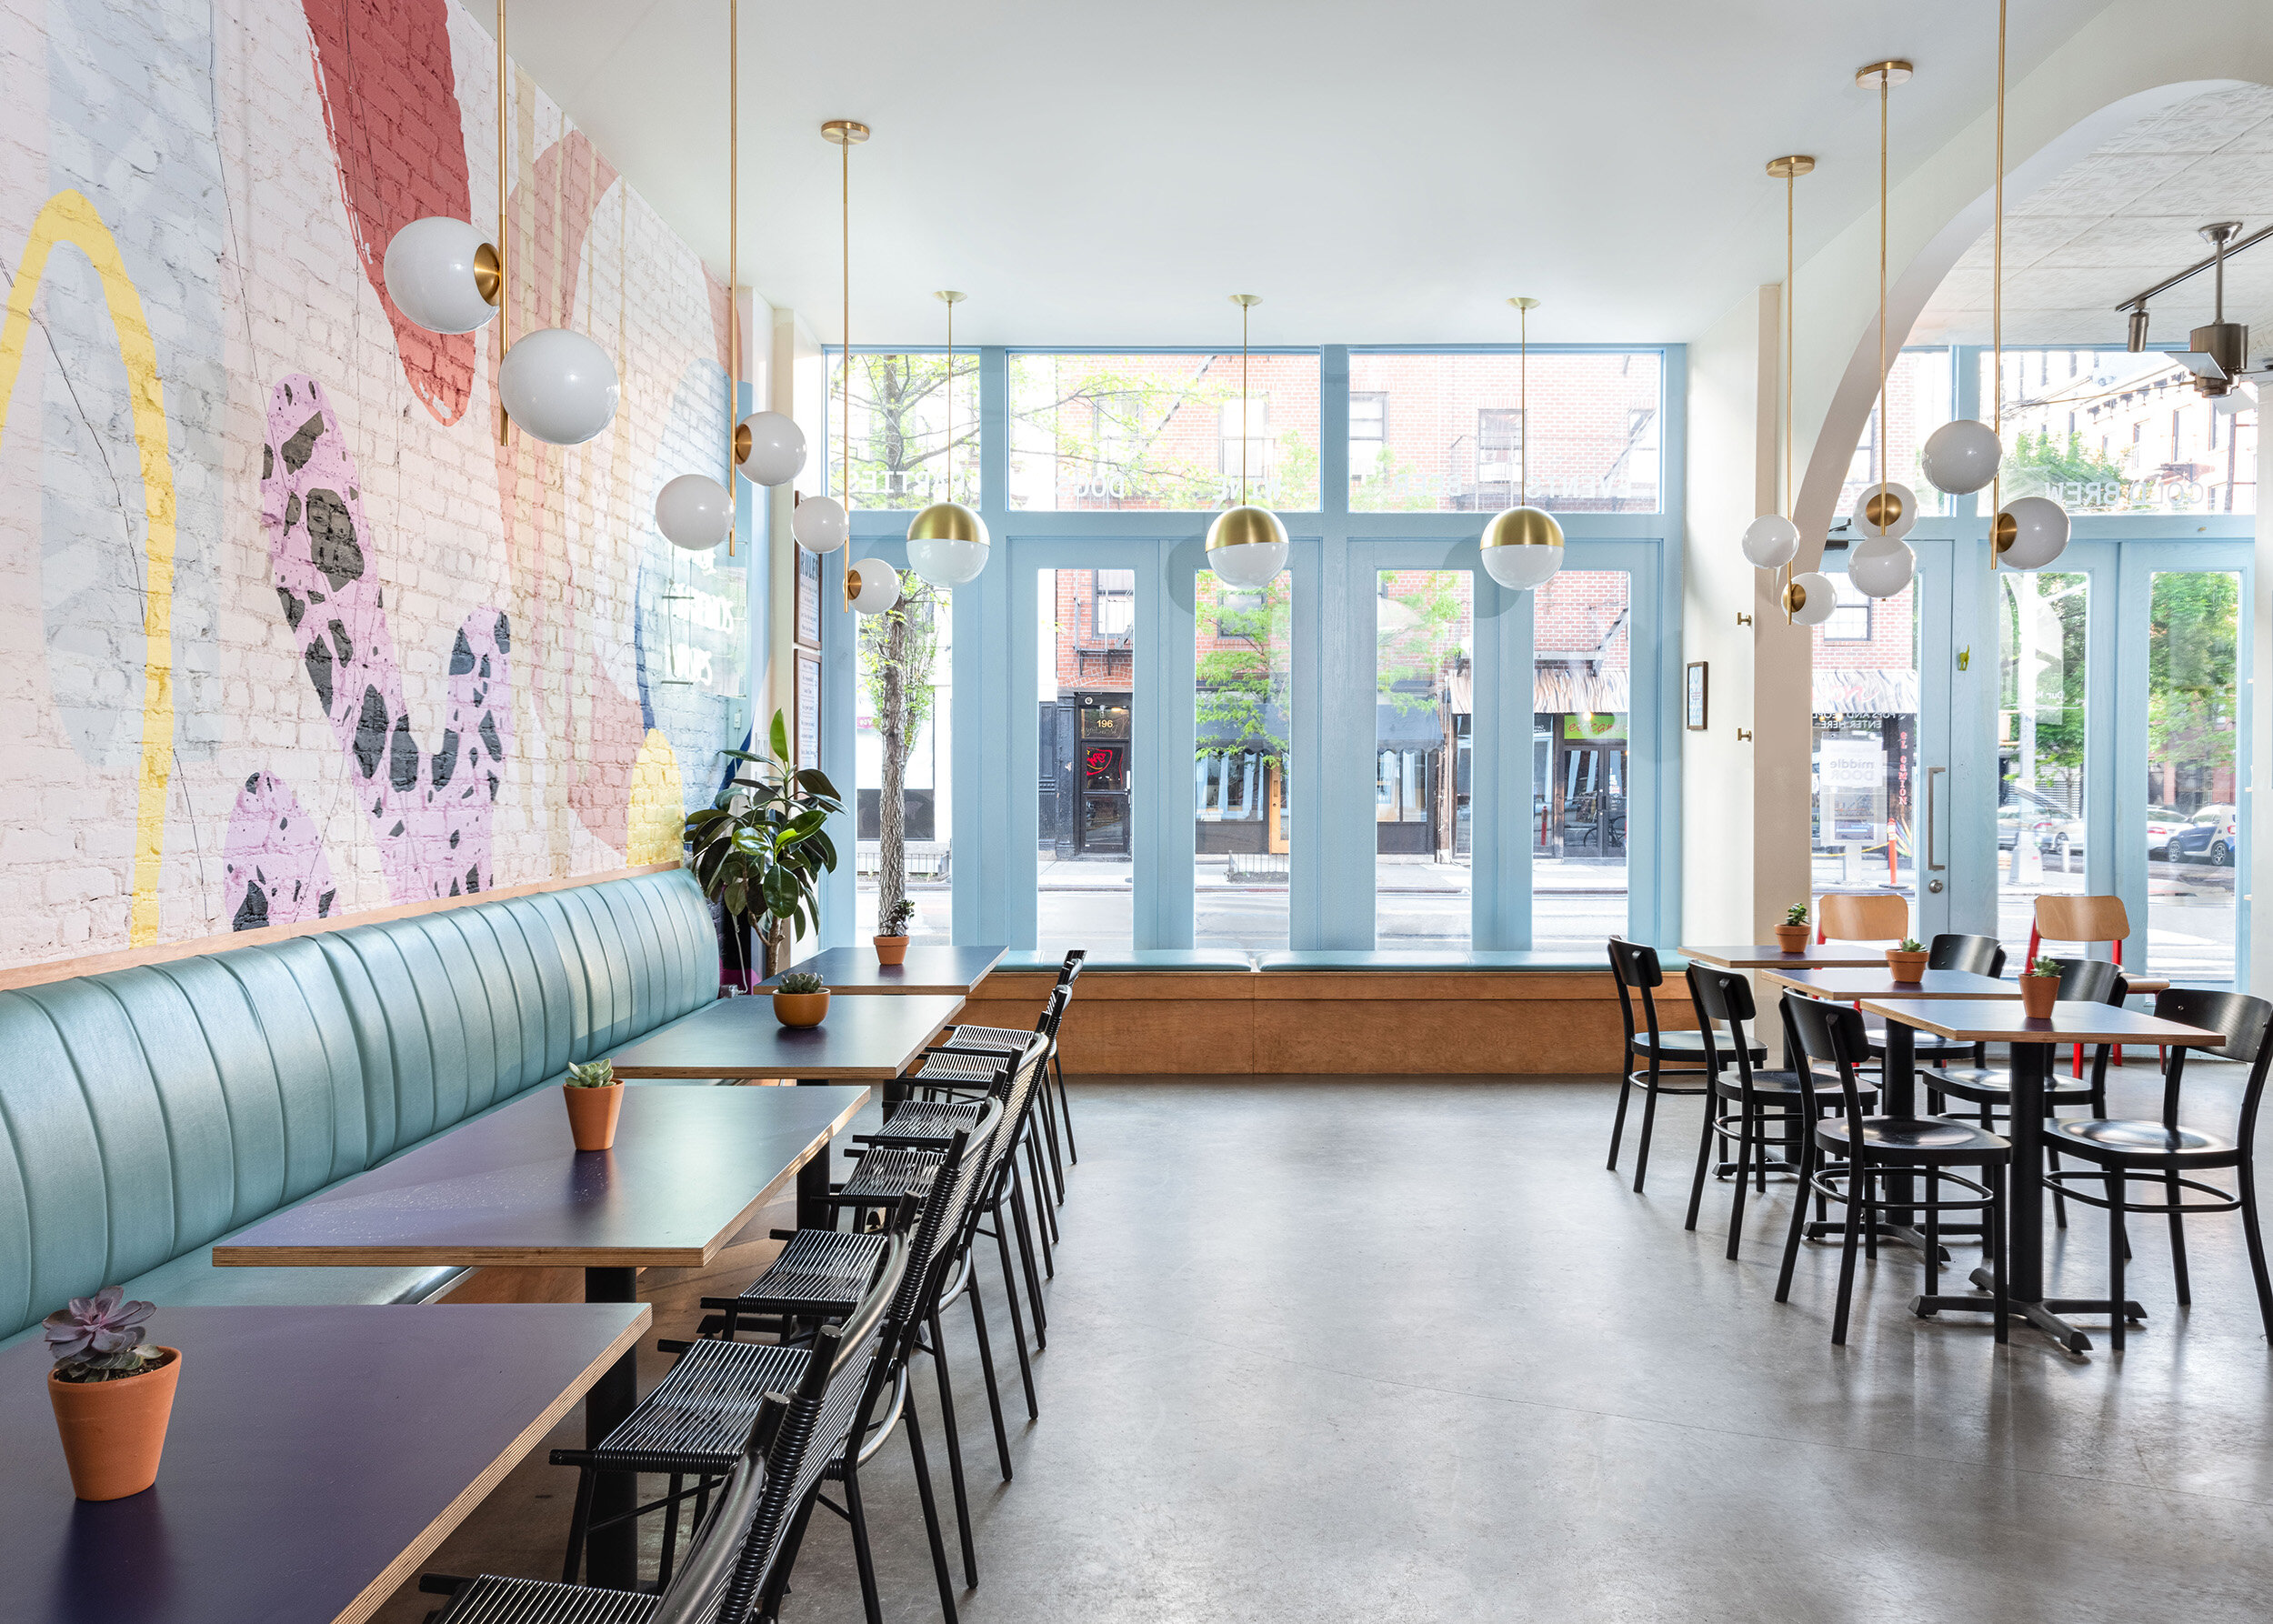 Colorful NYC cafe interior design by Lorla Studio 02.jpg